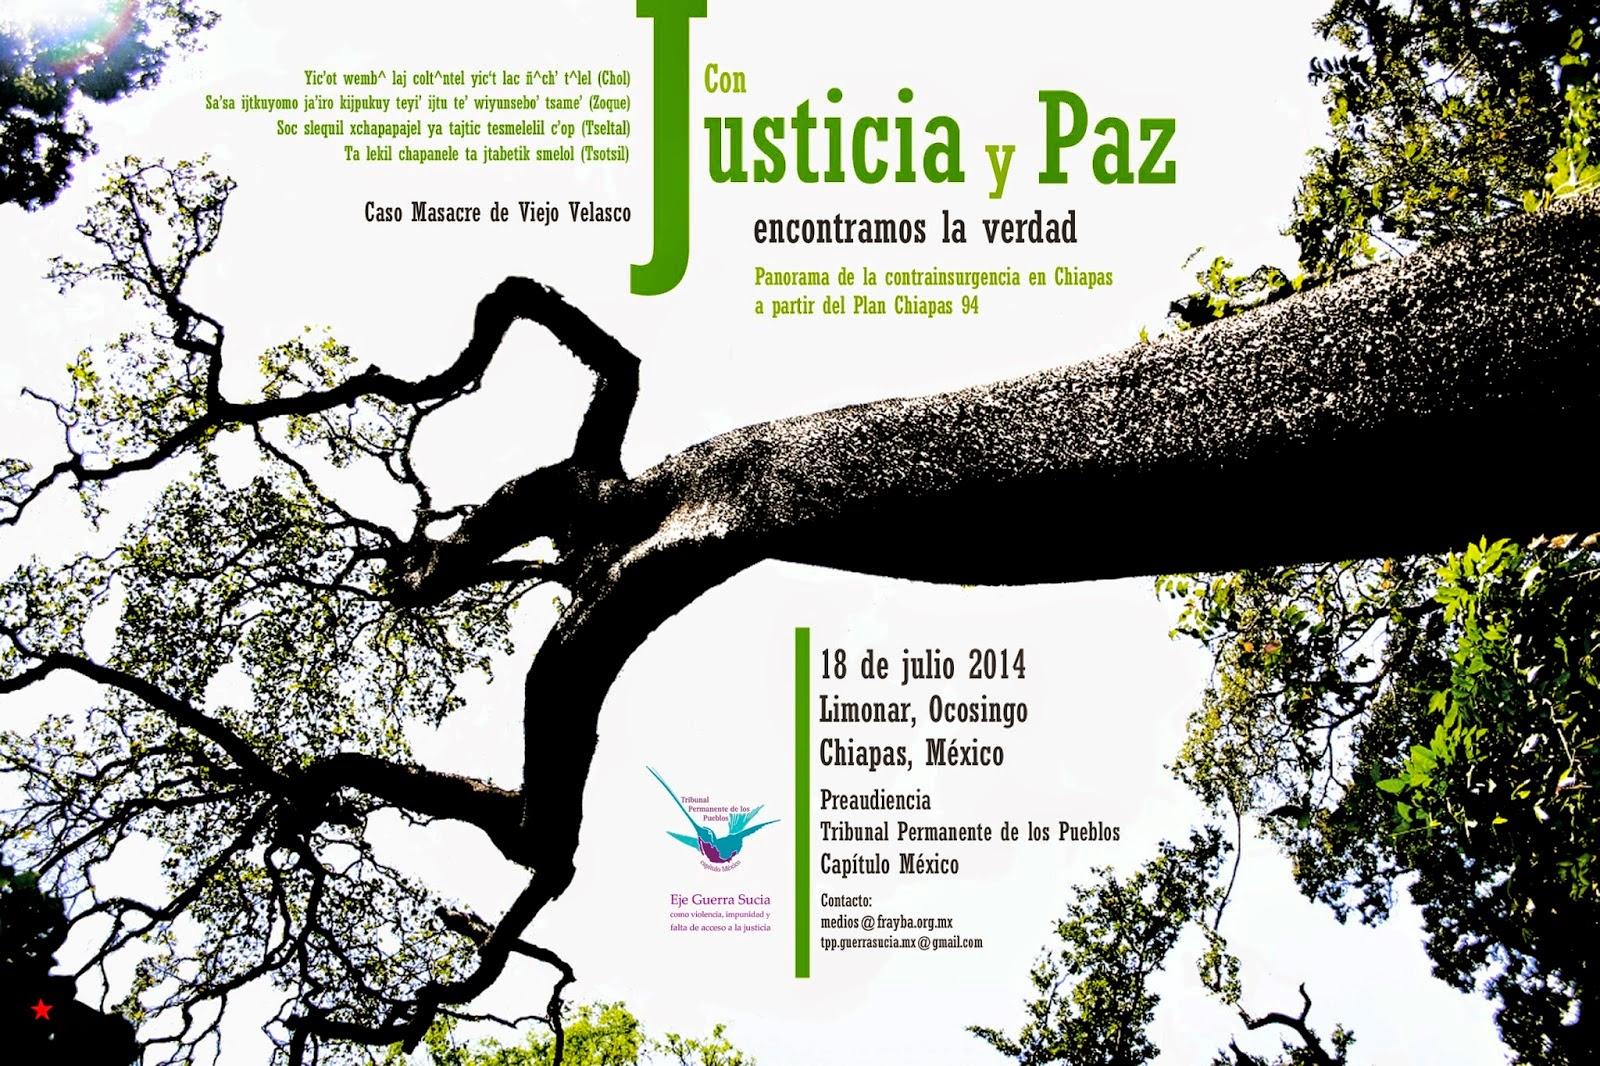 Preaudiencia TPP Chiapas Contrainsurgencia